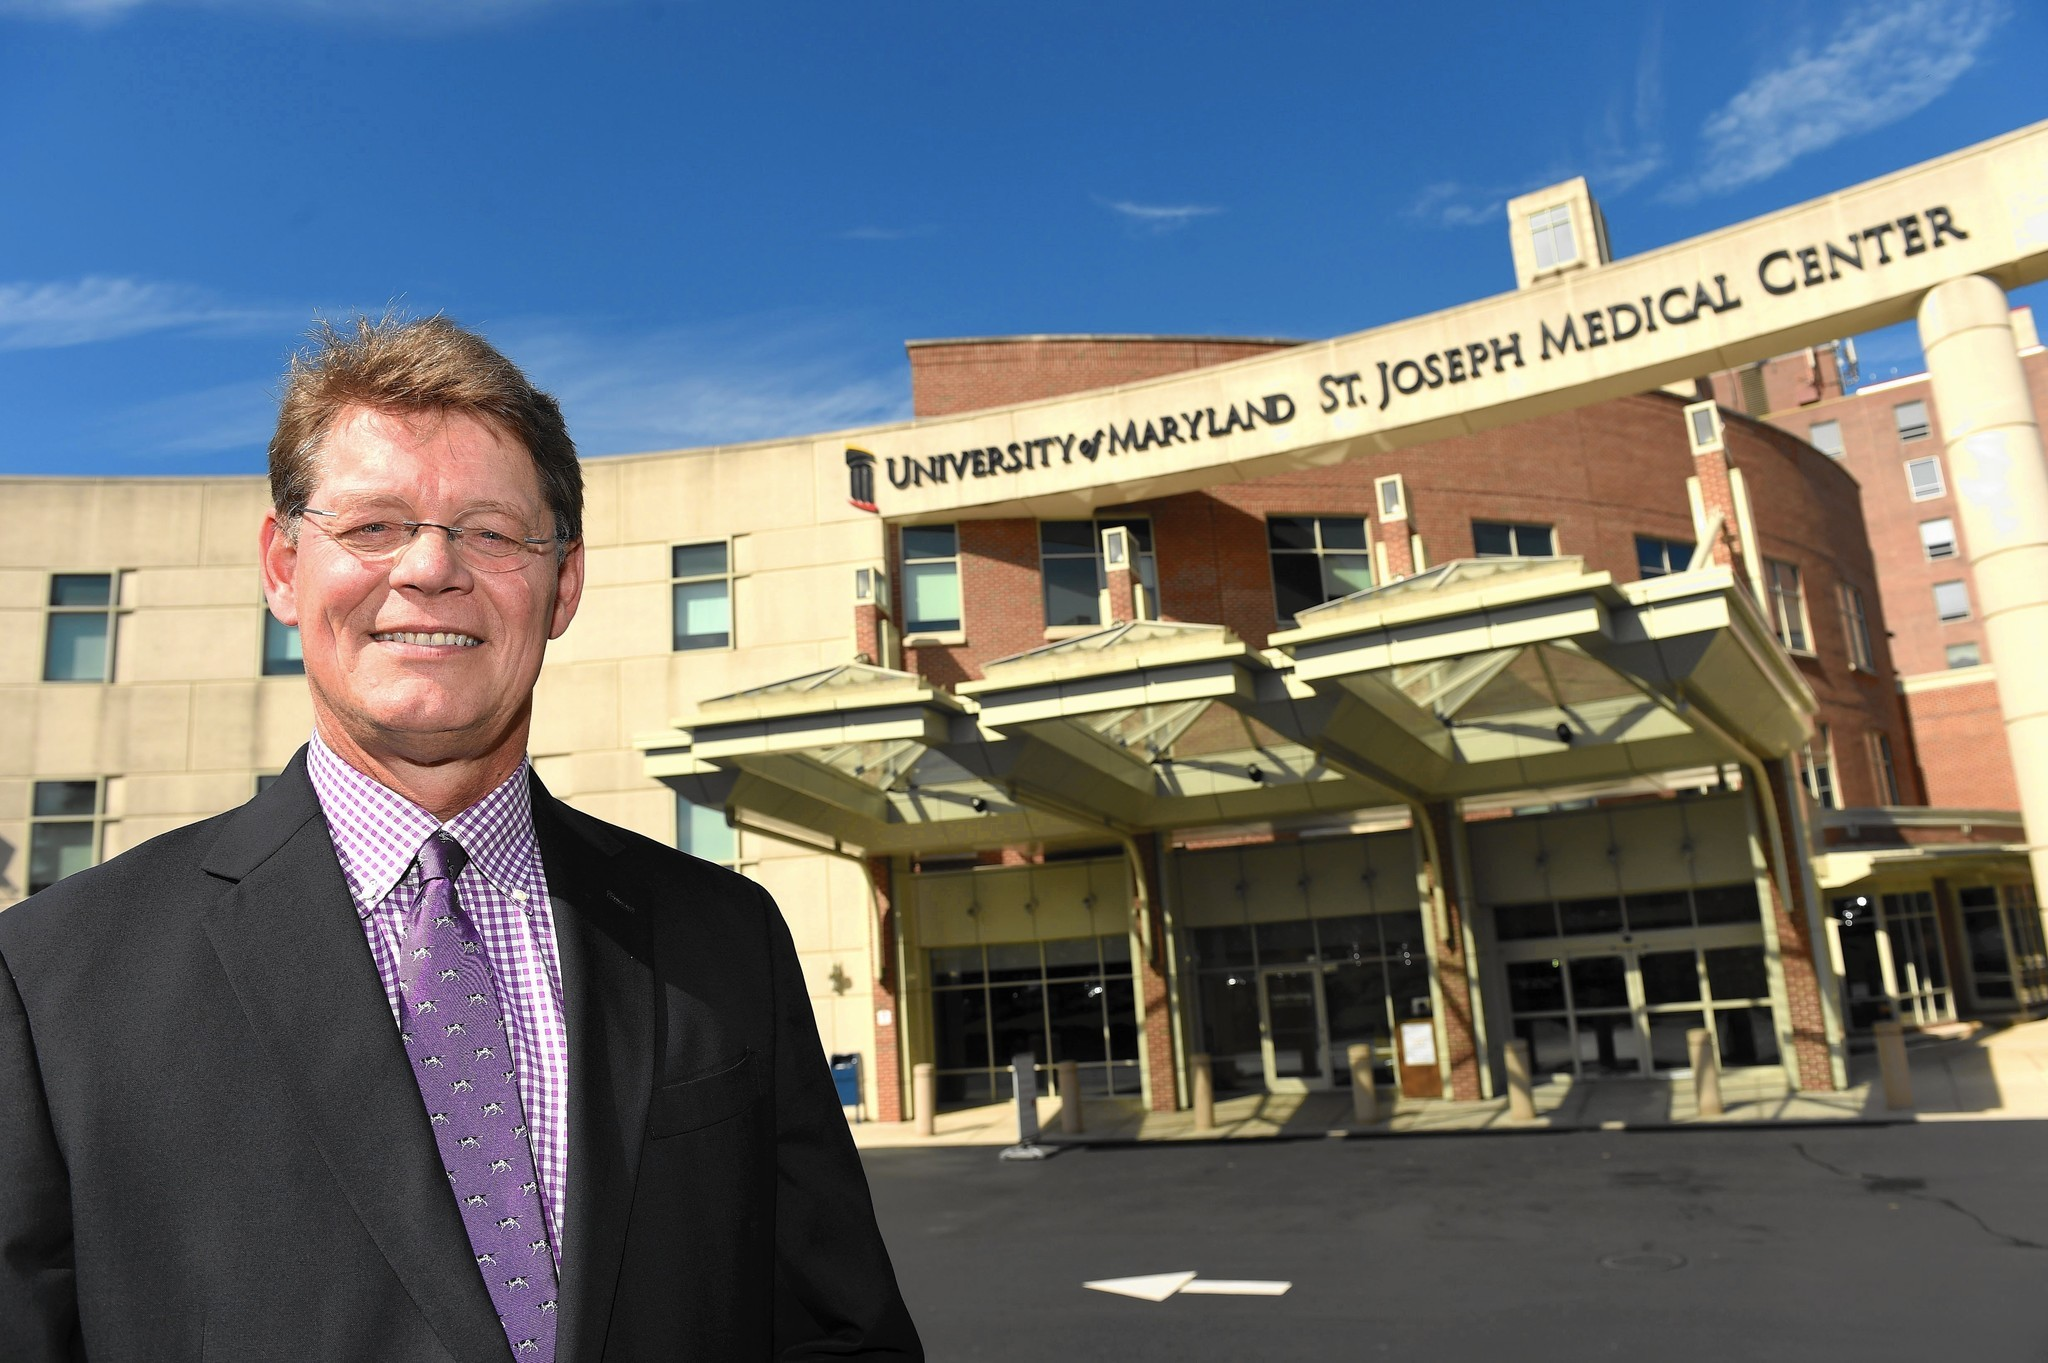 university of maryland st  joseph medical center u0026 39 s new president knows the hospital intimately